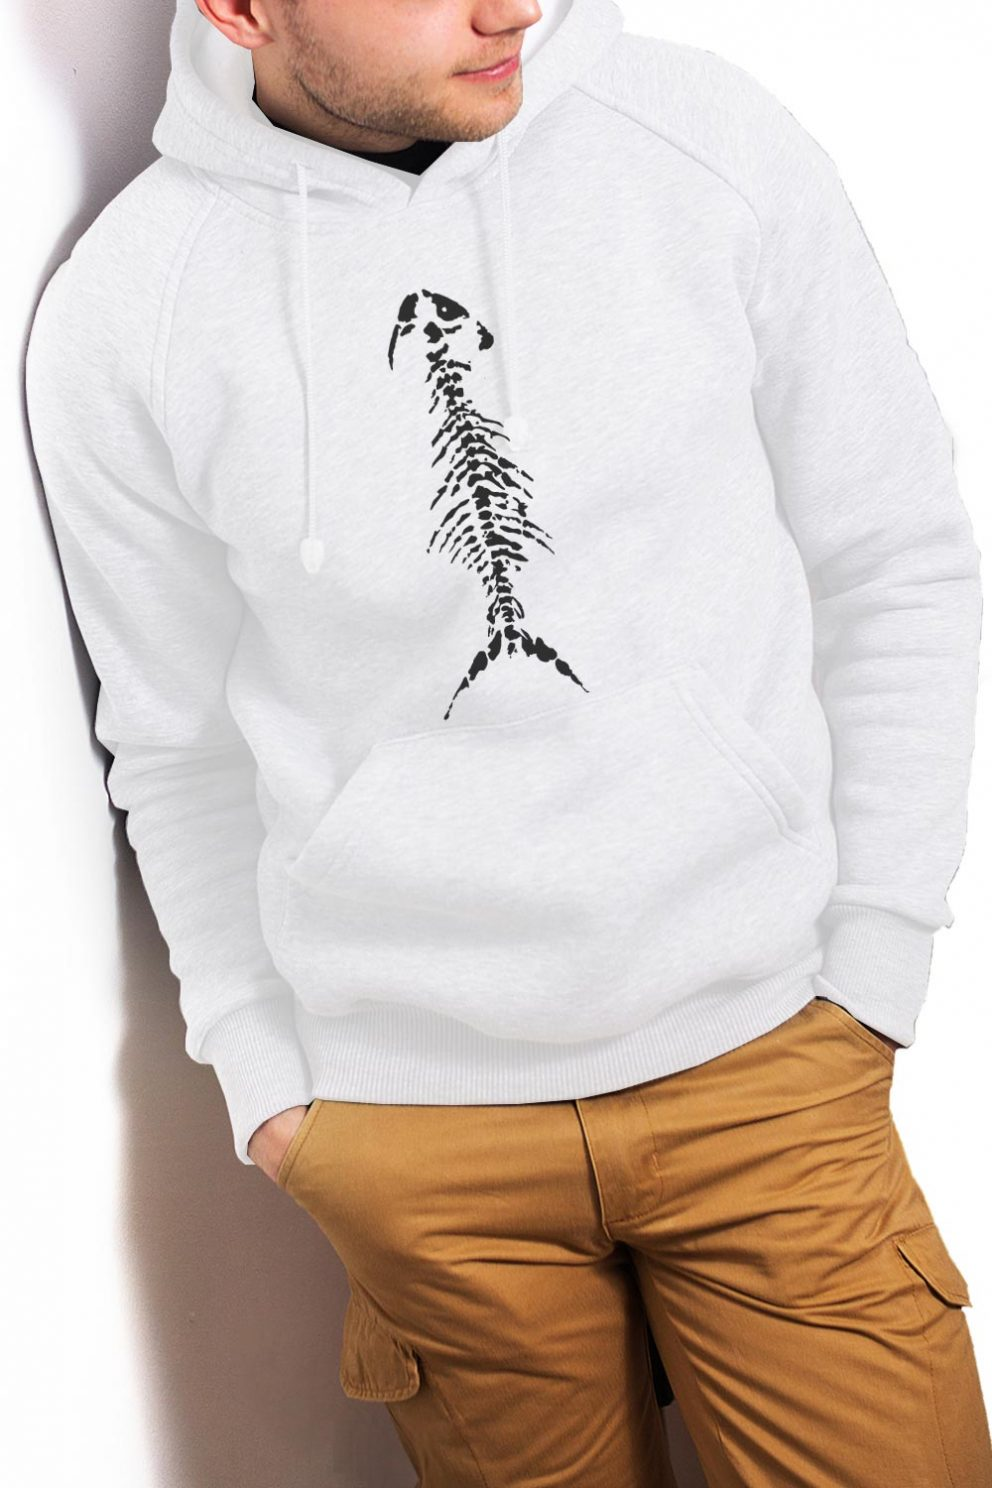 Kyst-shirt Olberg North Hoodie